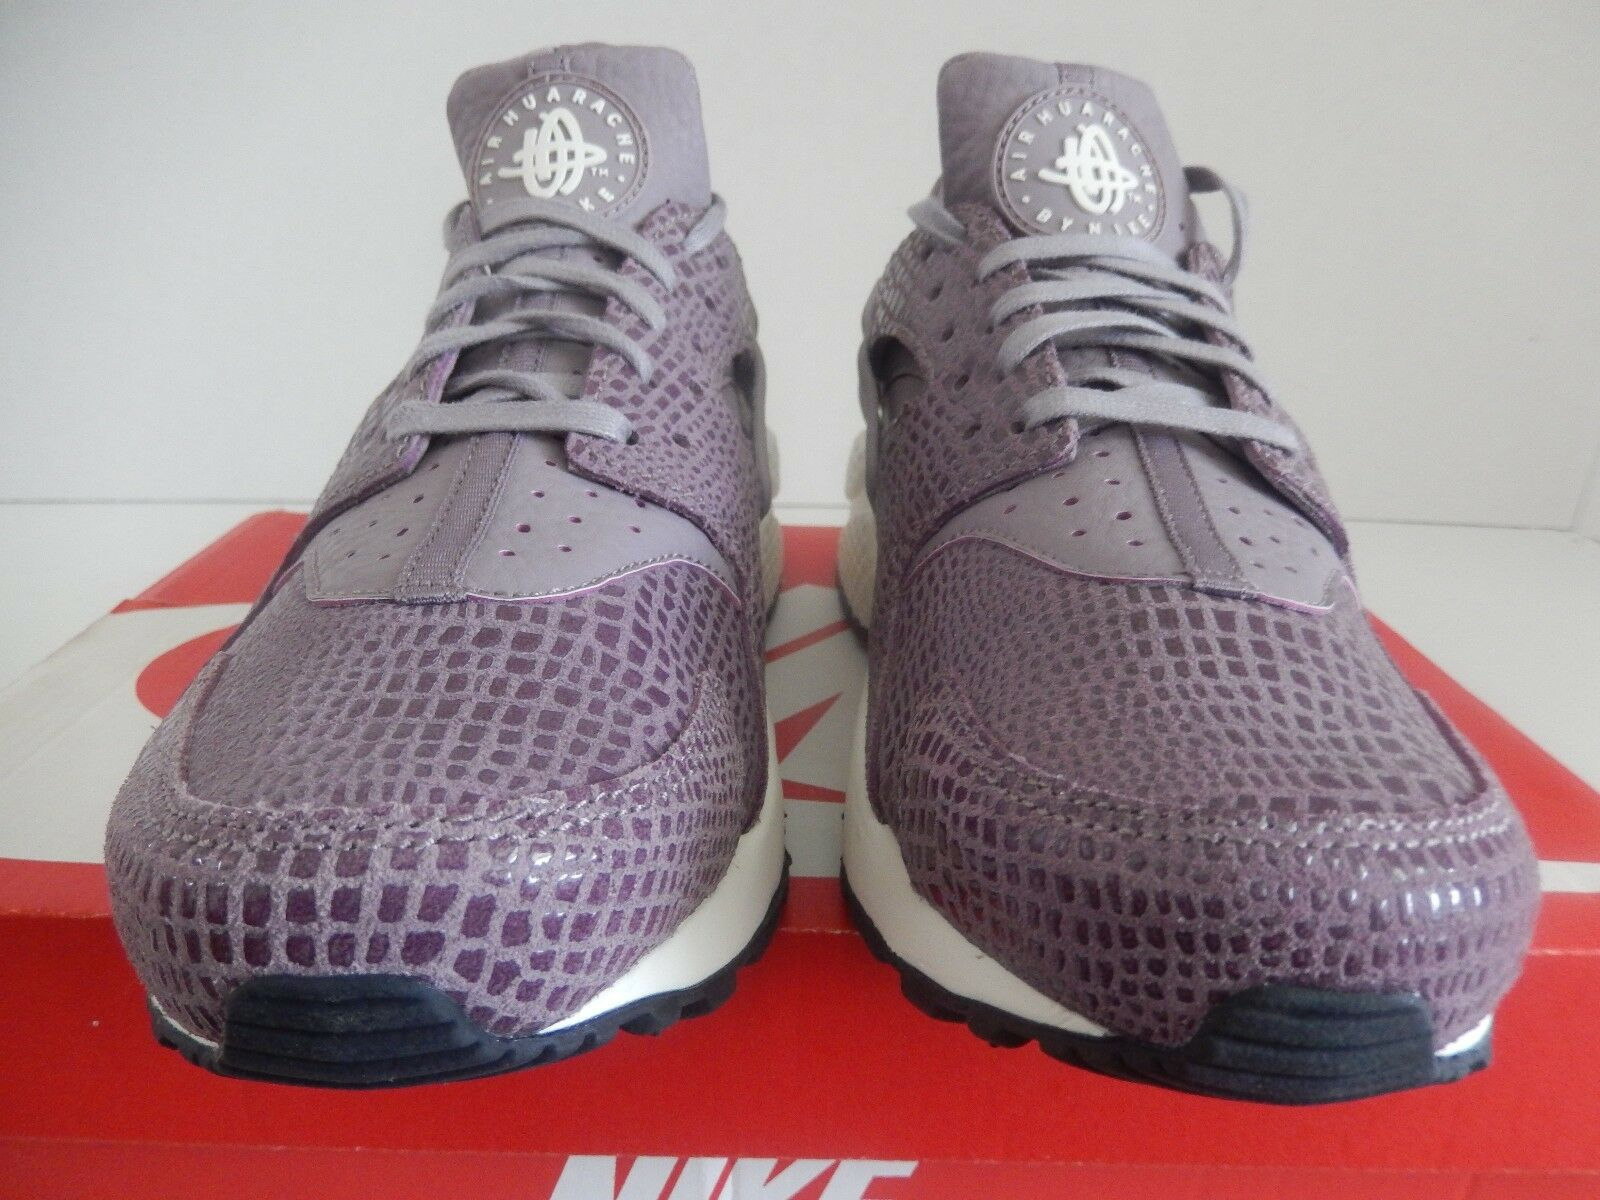 Mujeres Nike Air Huarache Run impresión Púrpura Humo Humo Humo Vela Talla 5 a24bc8